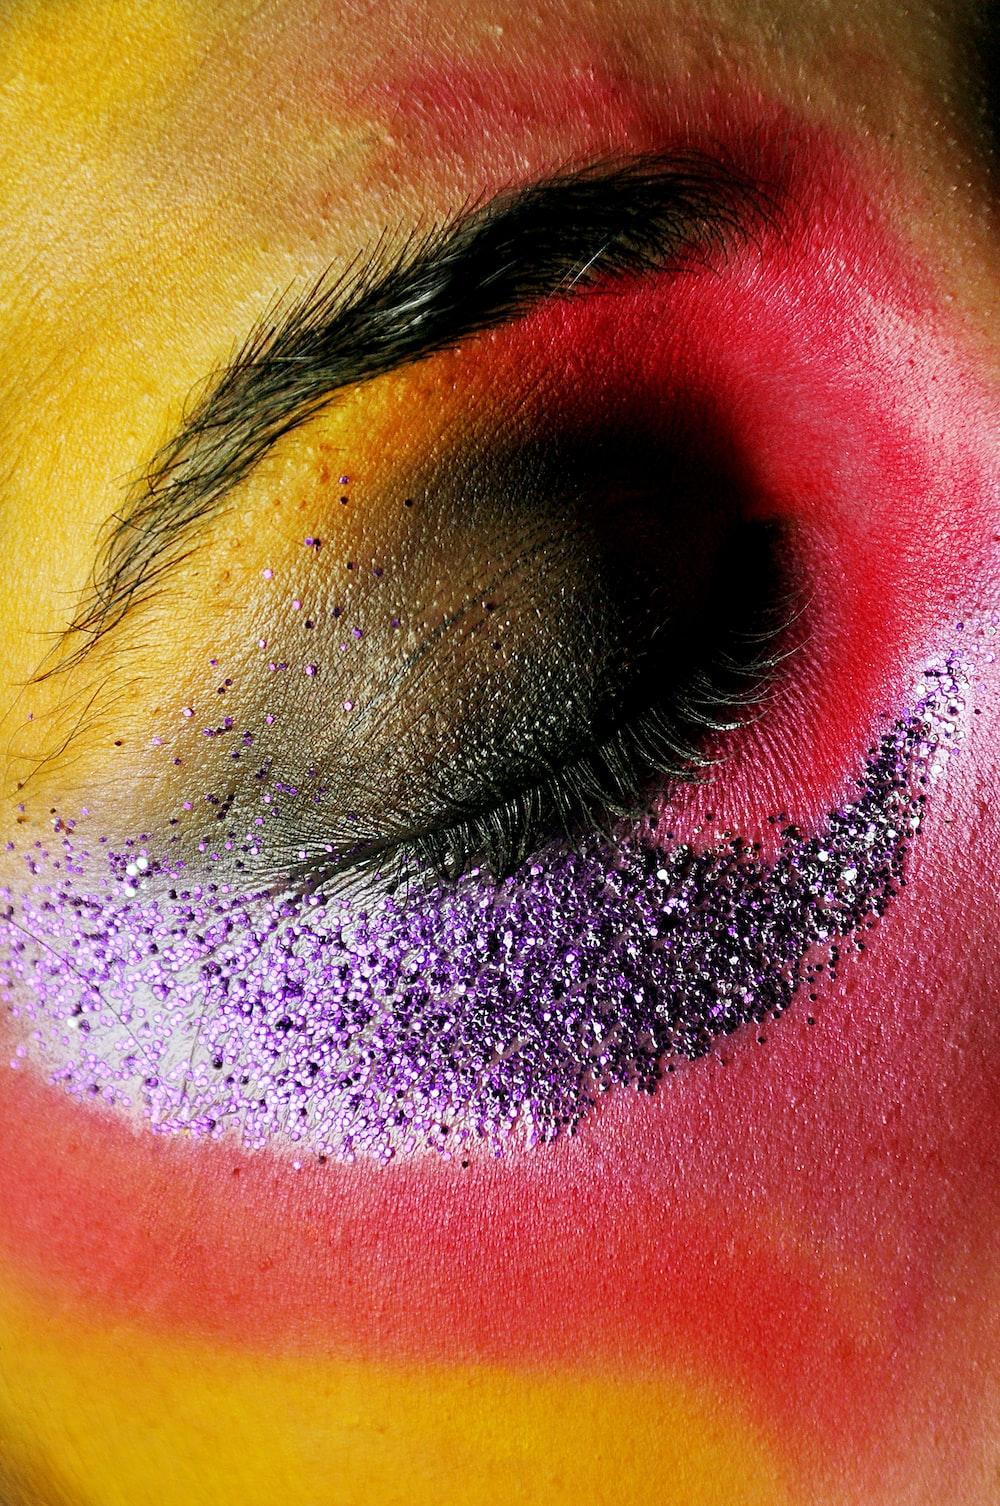 close-up of human's eye